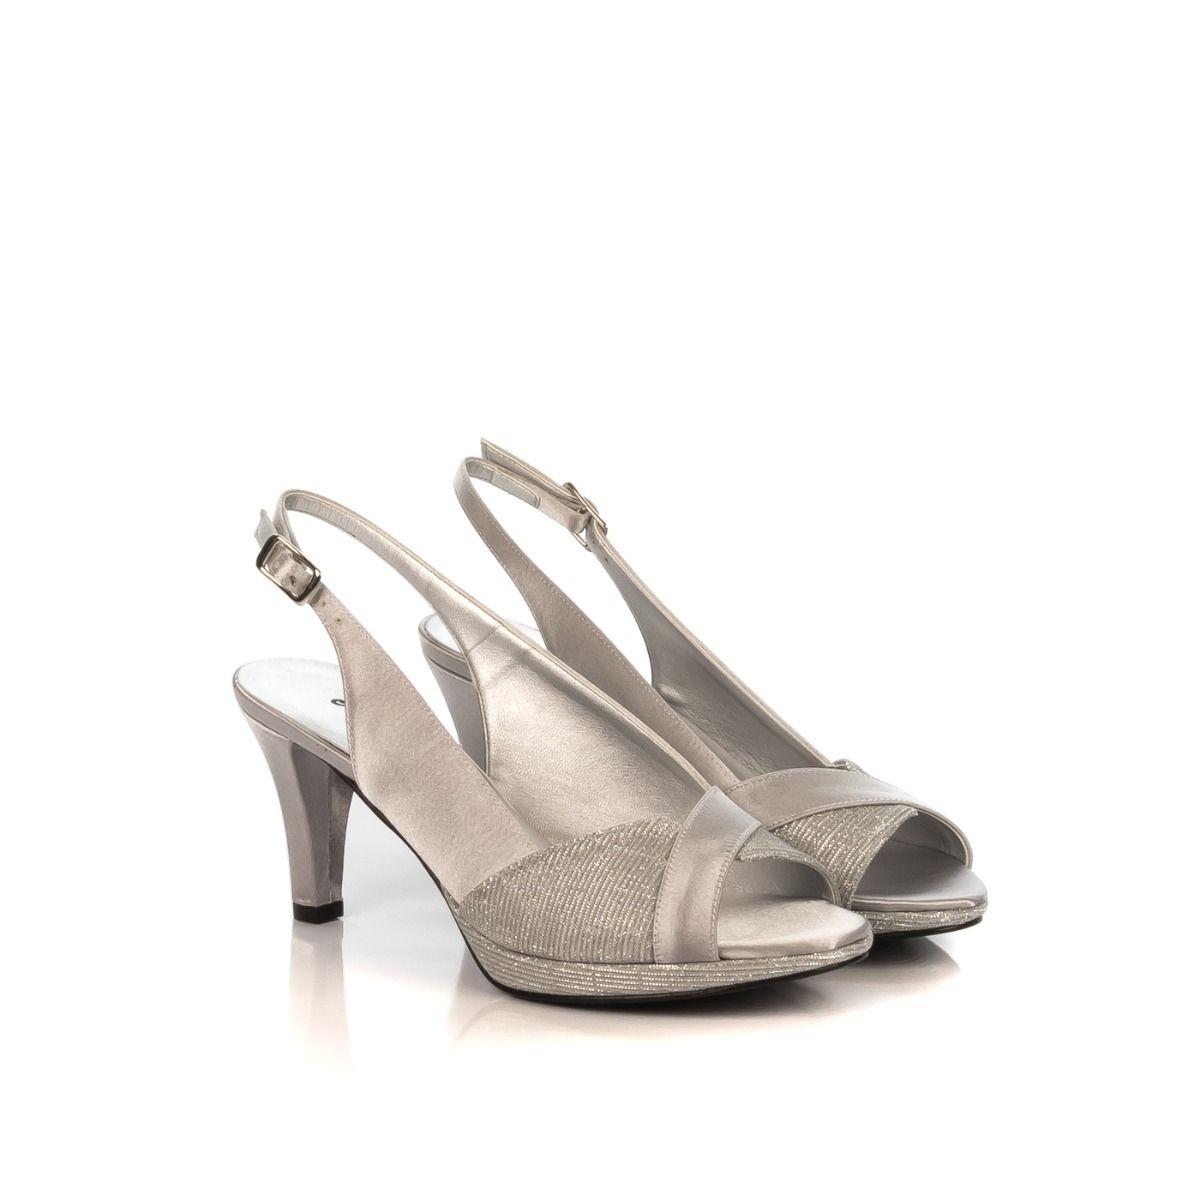 36d9b2e7c4 Sandalo donna|MELLUSO J545N GALASSIA in tessuto argento lamè|Spedizione  gratuita|Shop online|Shoe Center